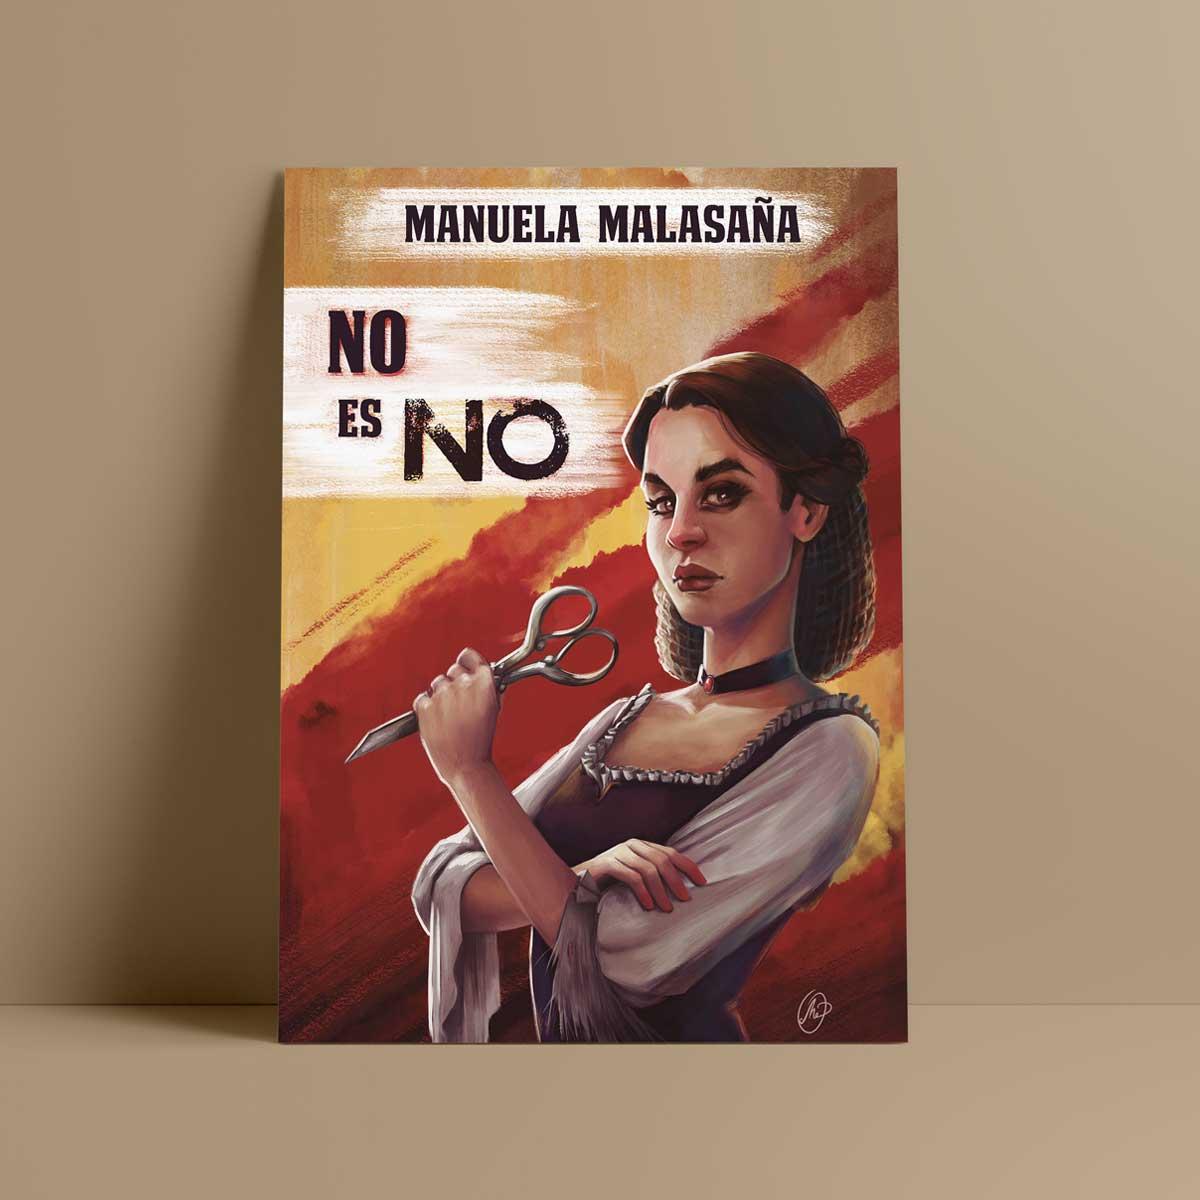 manuela_malasana_mercedes_palacios_01